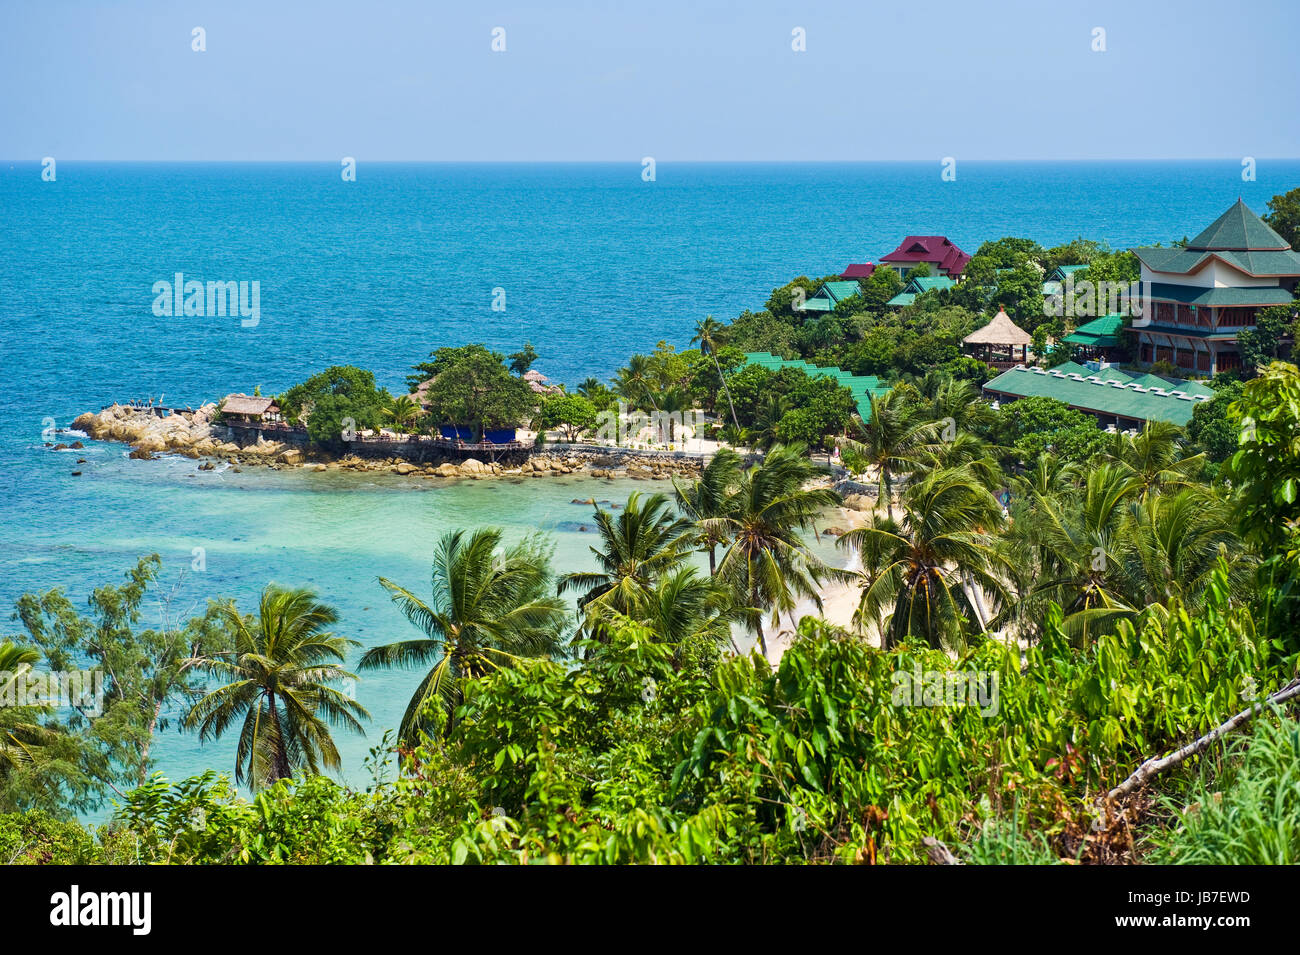 Beautiful tropical beach, Thailand - Stock Image